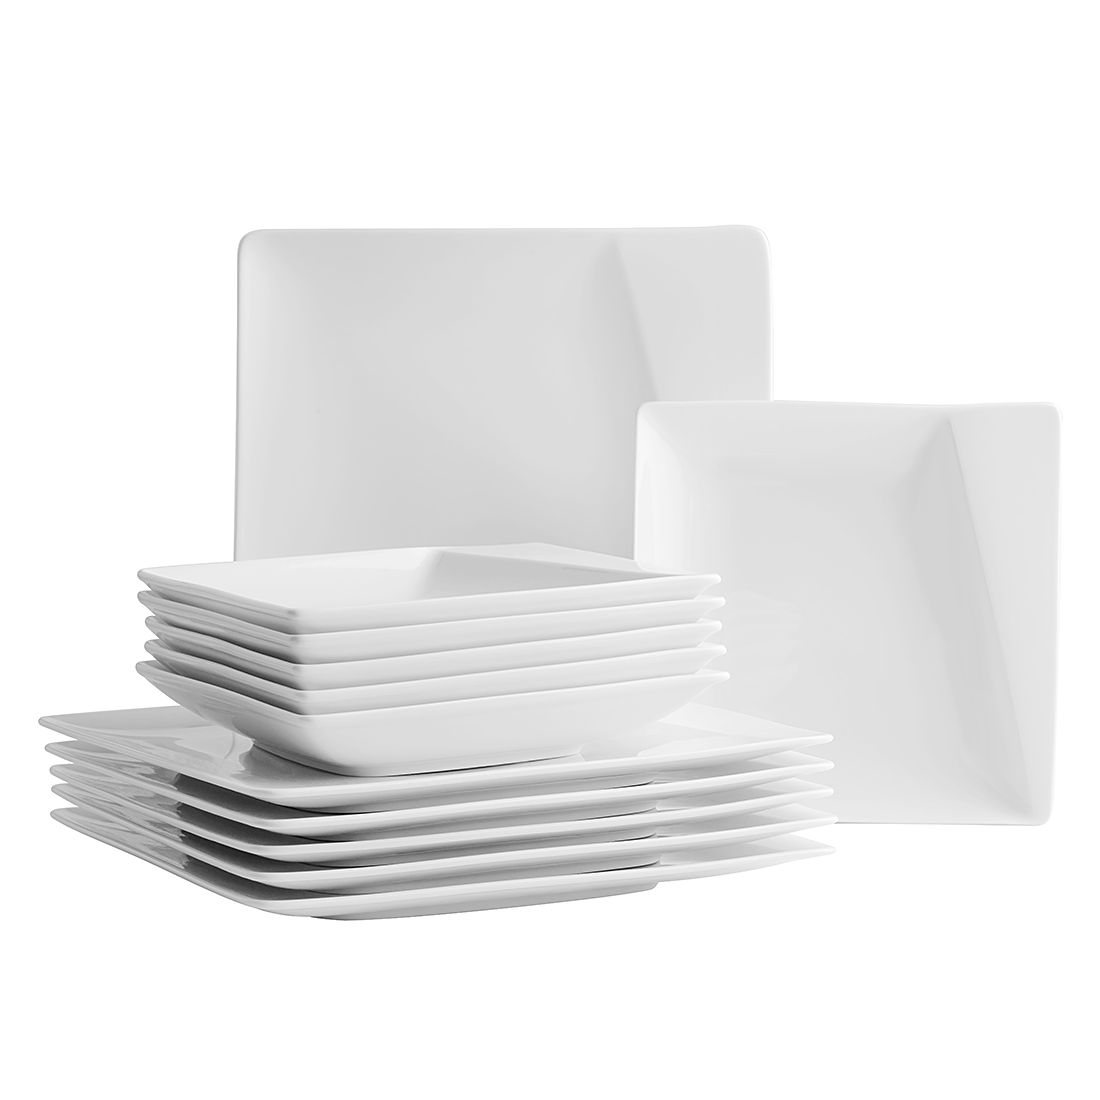 Tafelservice (12- teilig) Quadro Pi – Porzellan/Weiss, Mäser jetzt bestellen